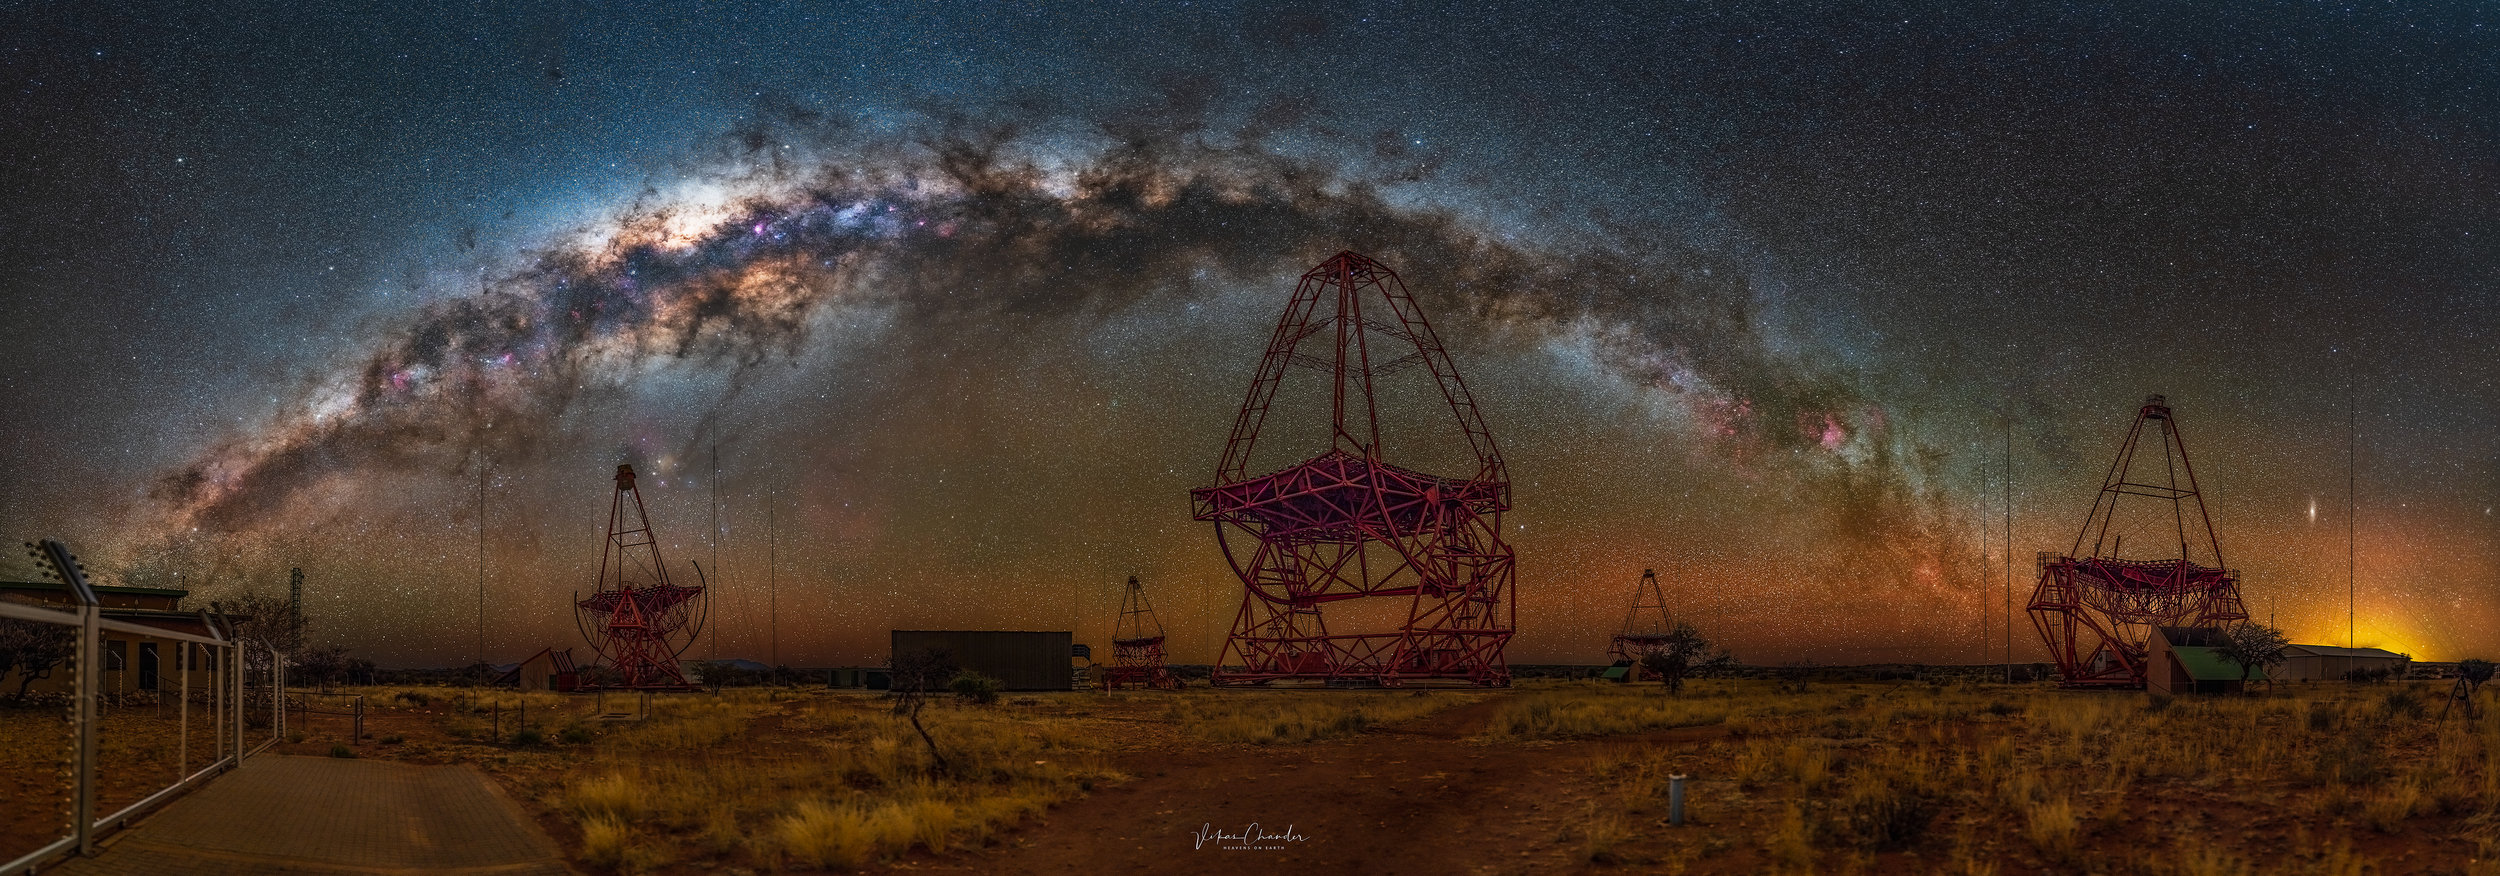 180912-2315-d850c-Hess-panorama.jpg